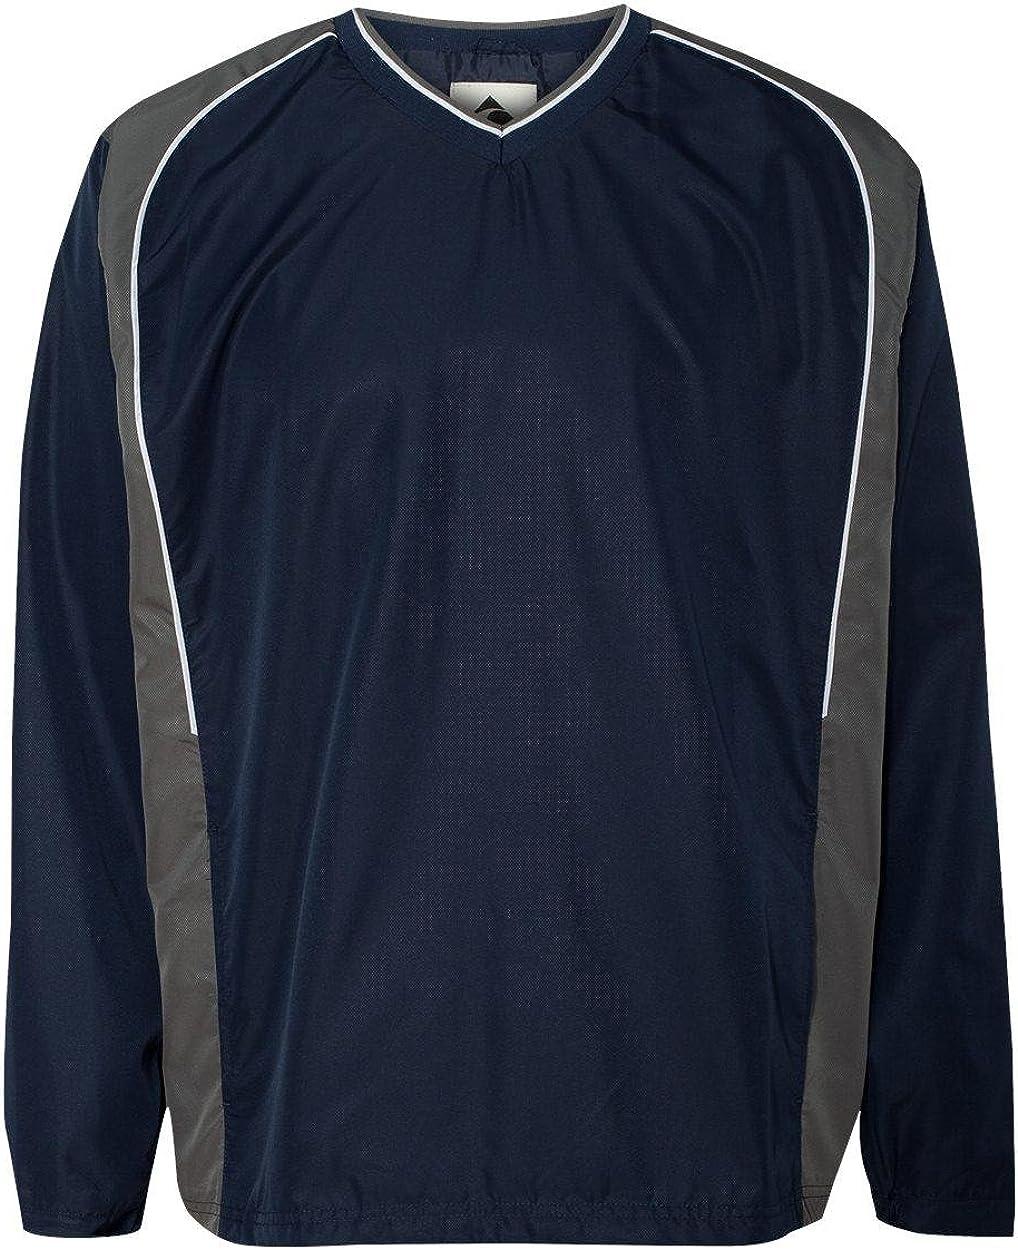 Augusta Sportswear Men's Pullover